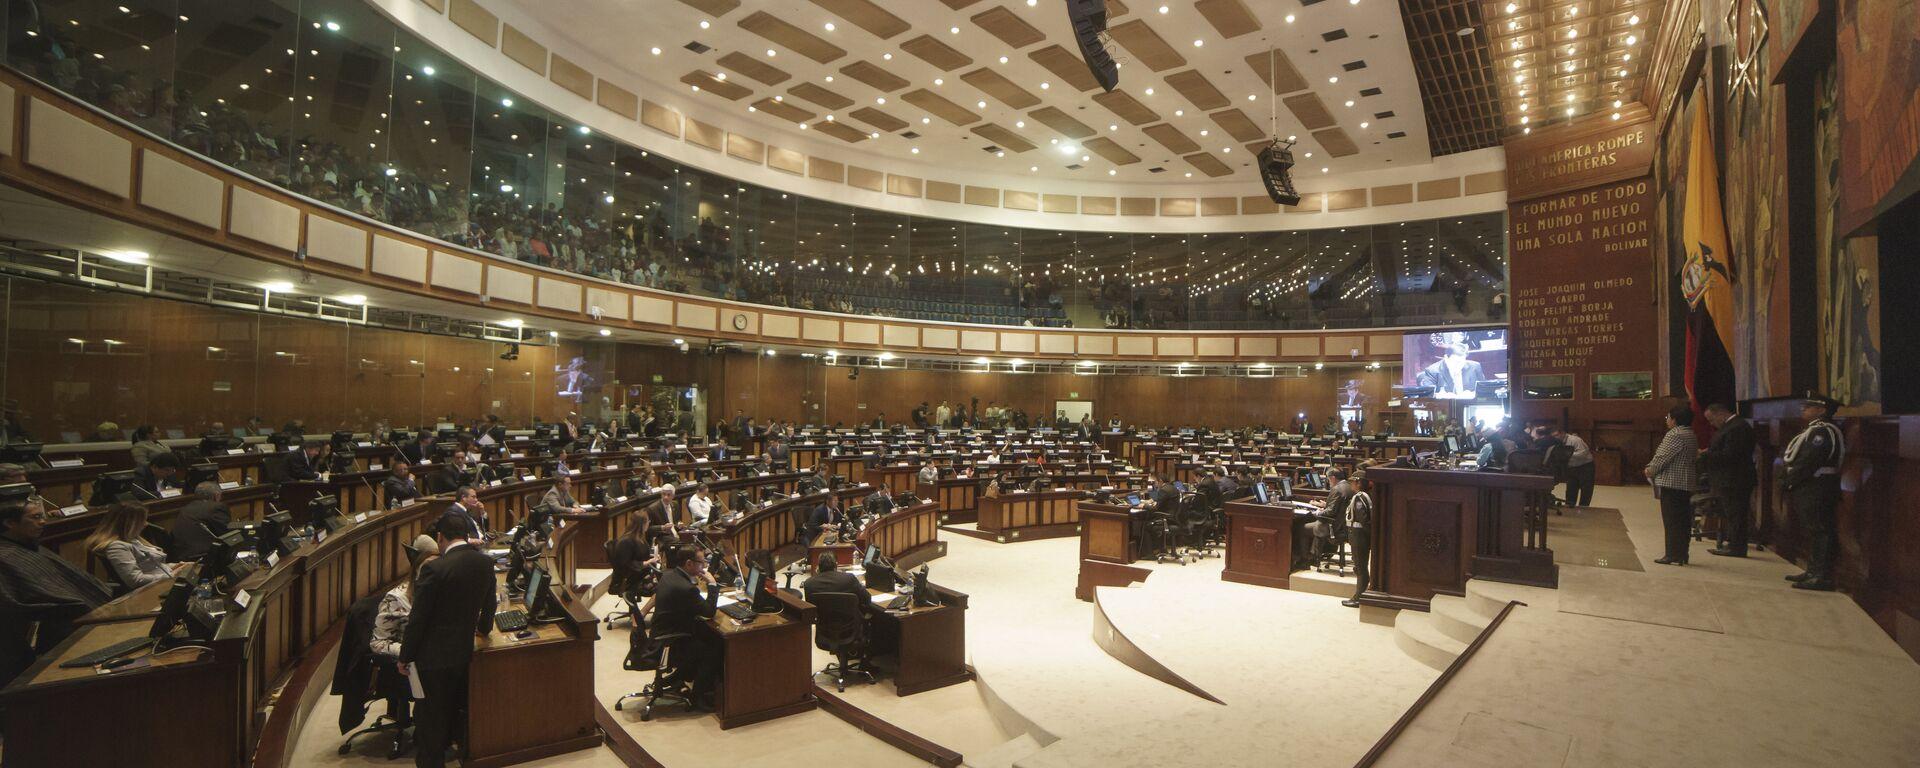 La Asamblea Nacional de Ecuador (archivo) - Sputnik Mundo, 1920, 30.06.2021